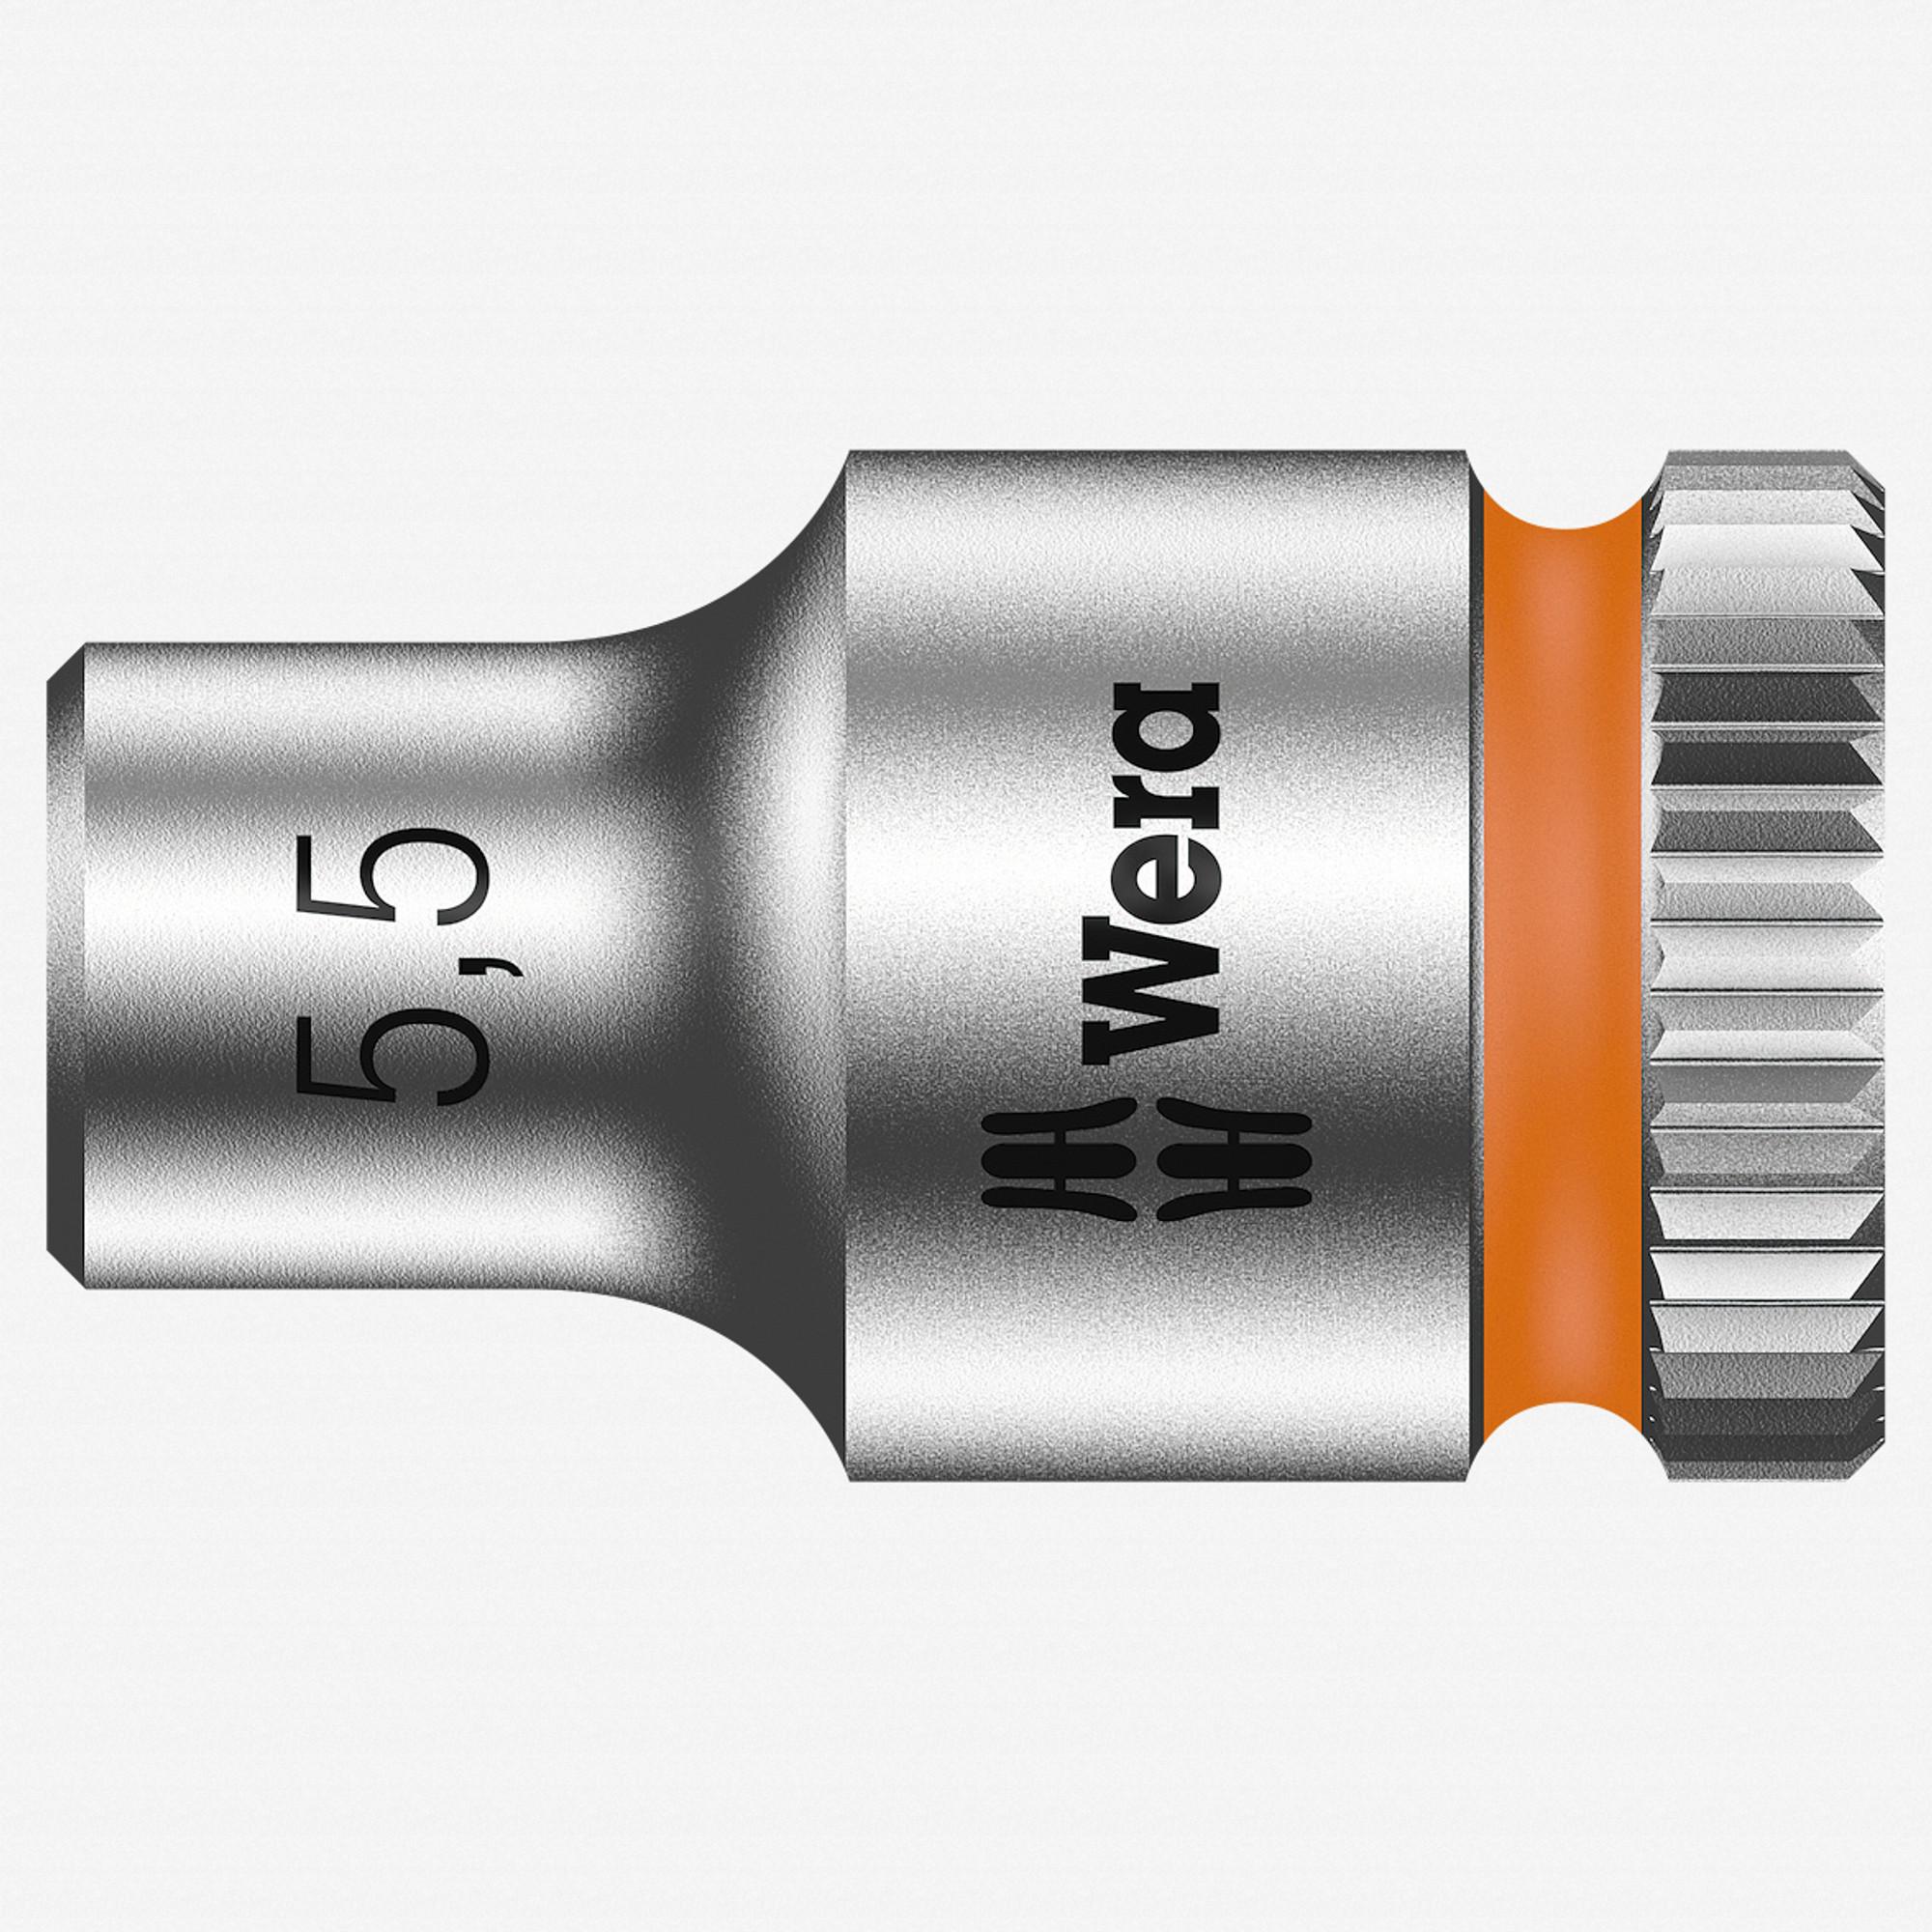 8790 HMA Deep 1//4 socket 13.0 mm